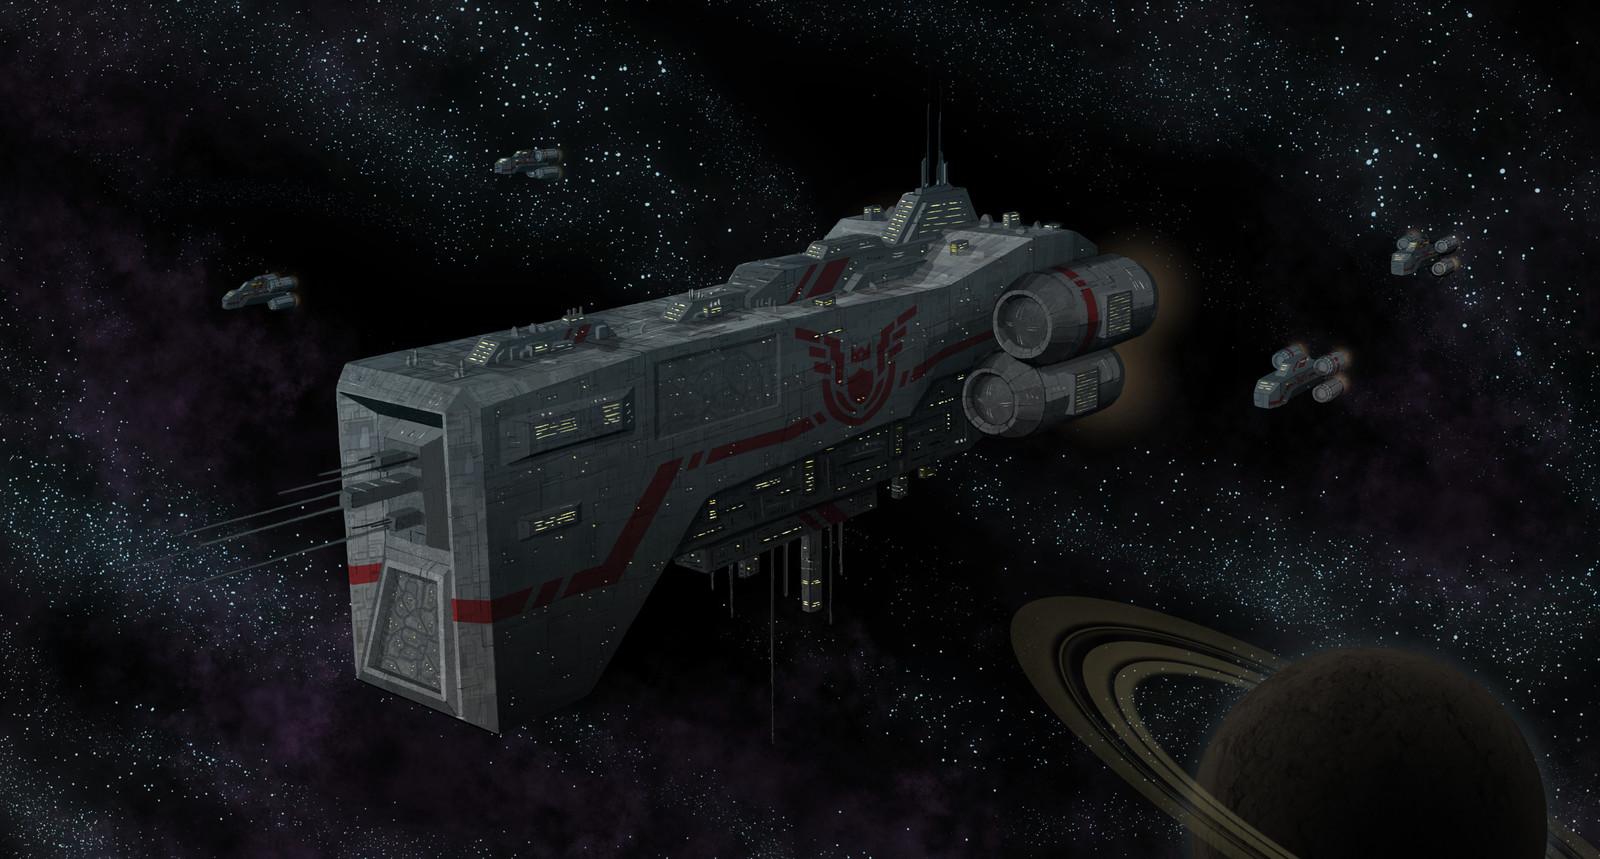 Scifi space scene